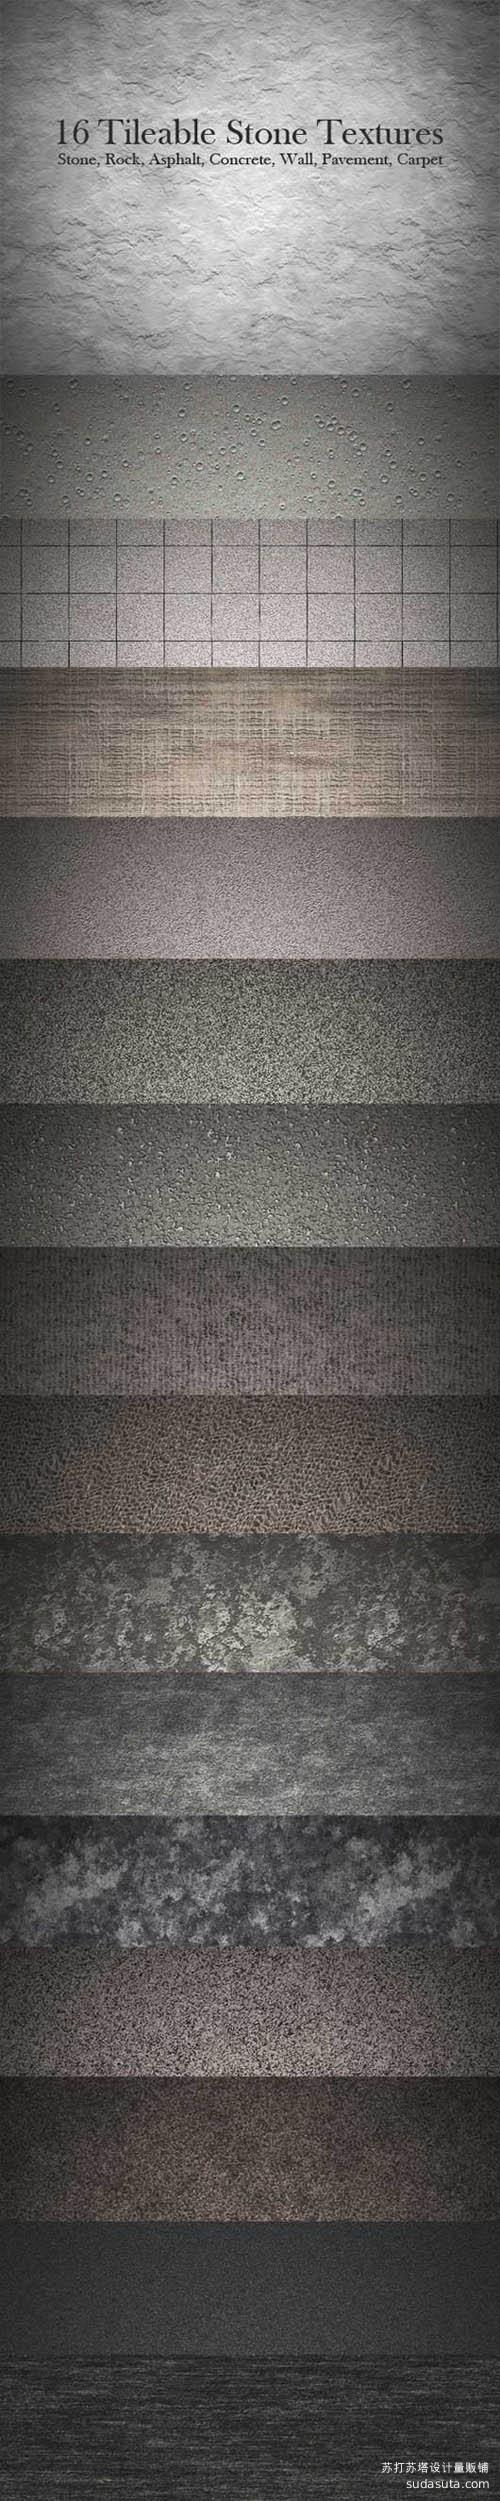 16个平铺的石纹理<br /> http://muzikizumweb.deviantart.com/art/16-Tileable-Stone-Textures-188736582